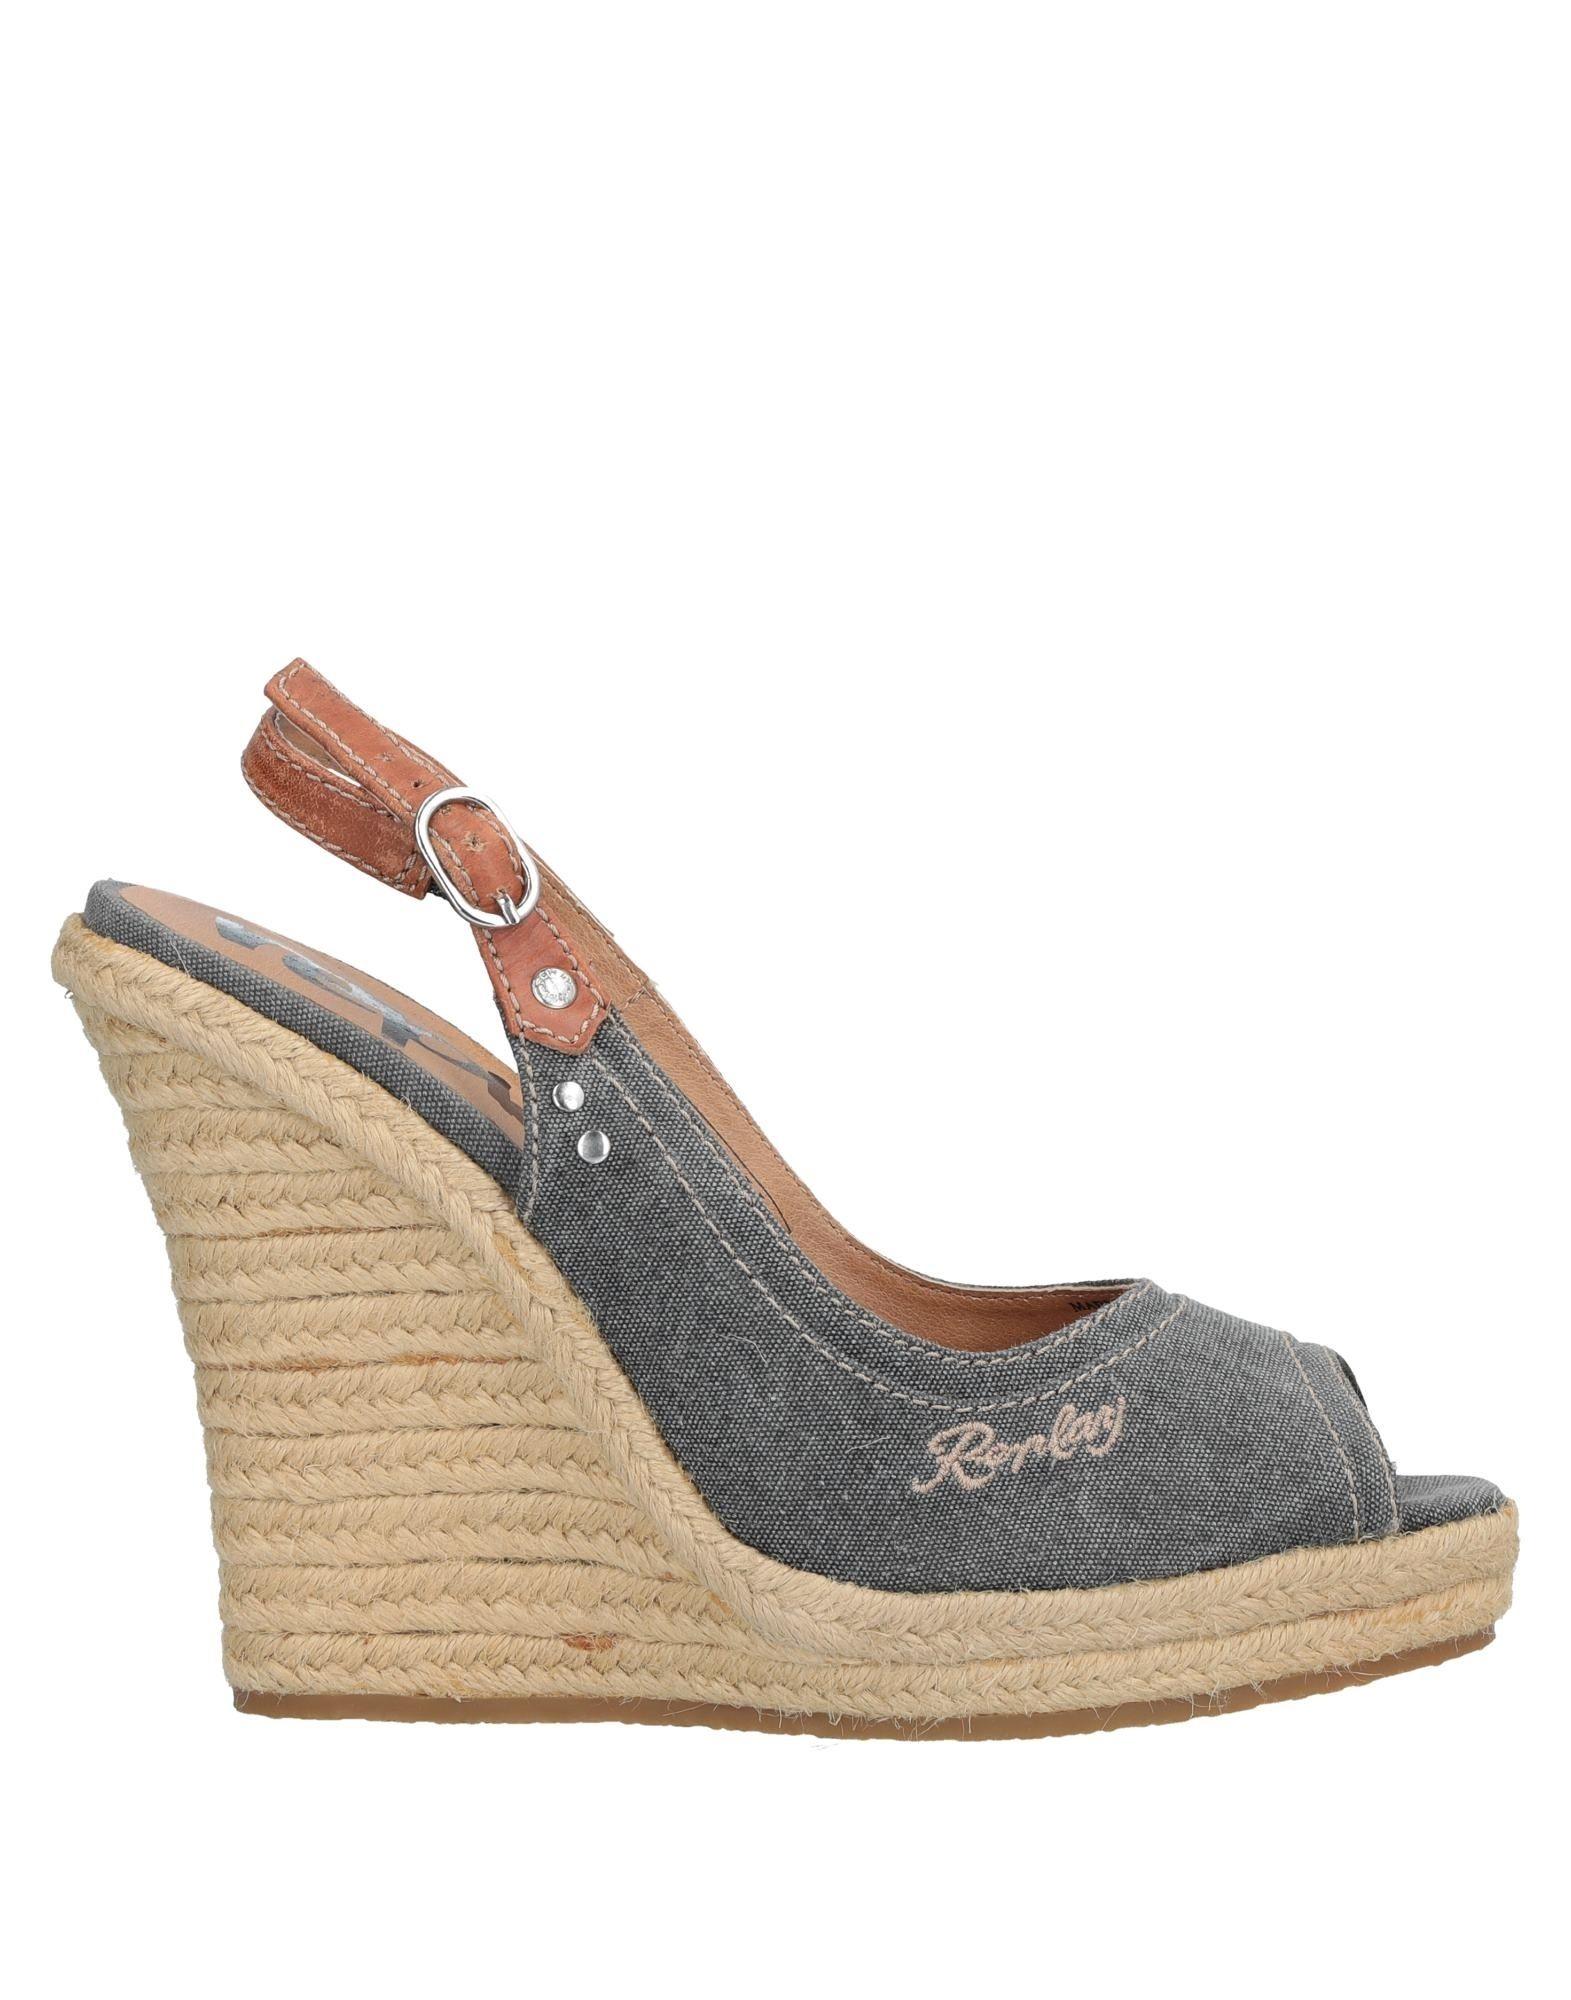 Haltbare Mode billige Schuhe Replay Sandalen Damen  11533721VK Heiße Schuhe